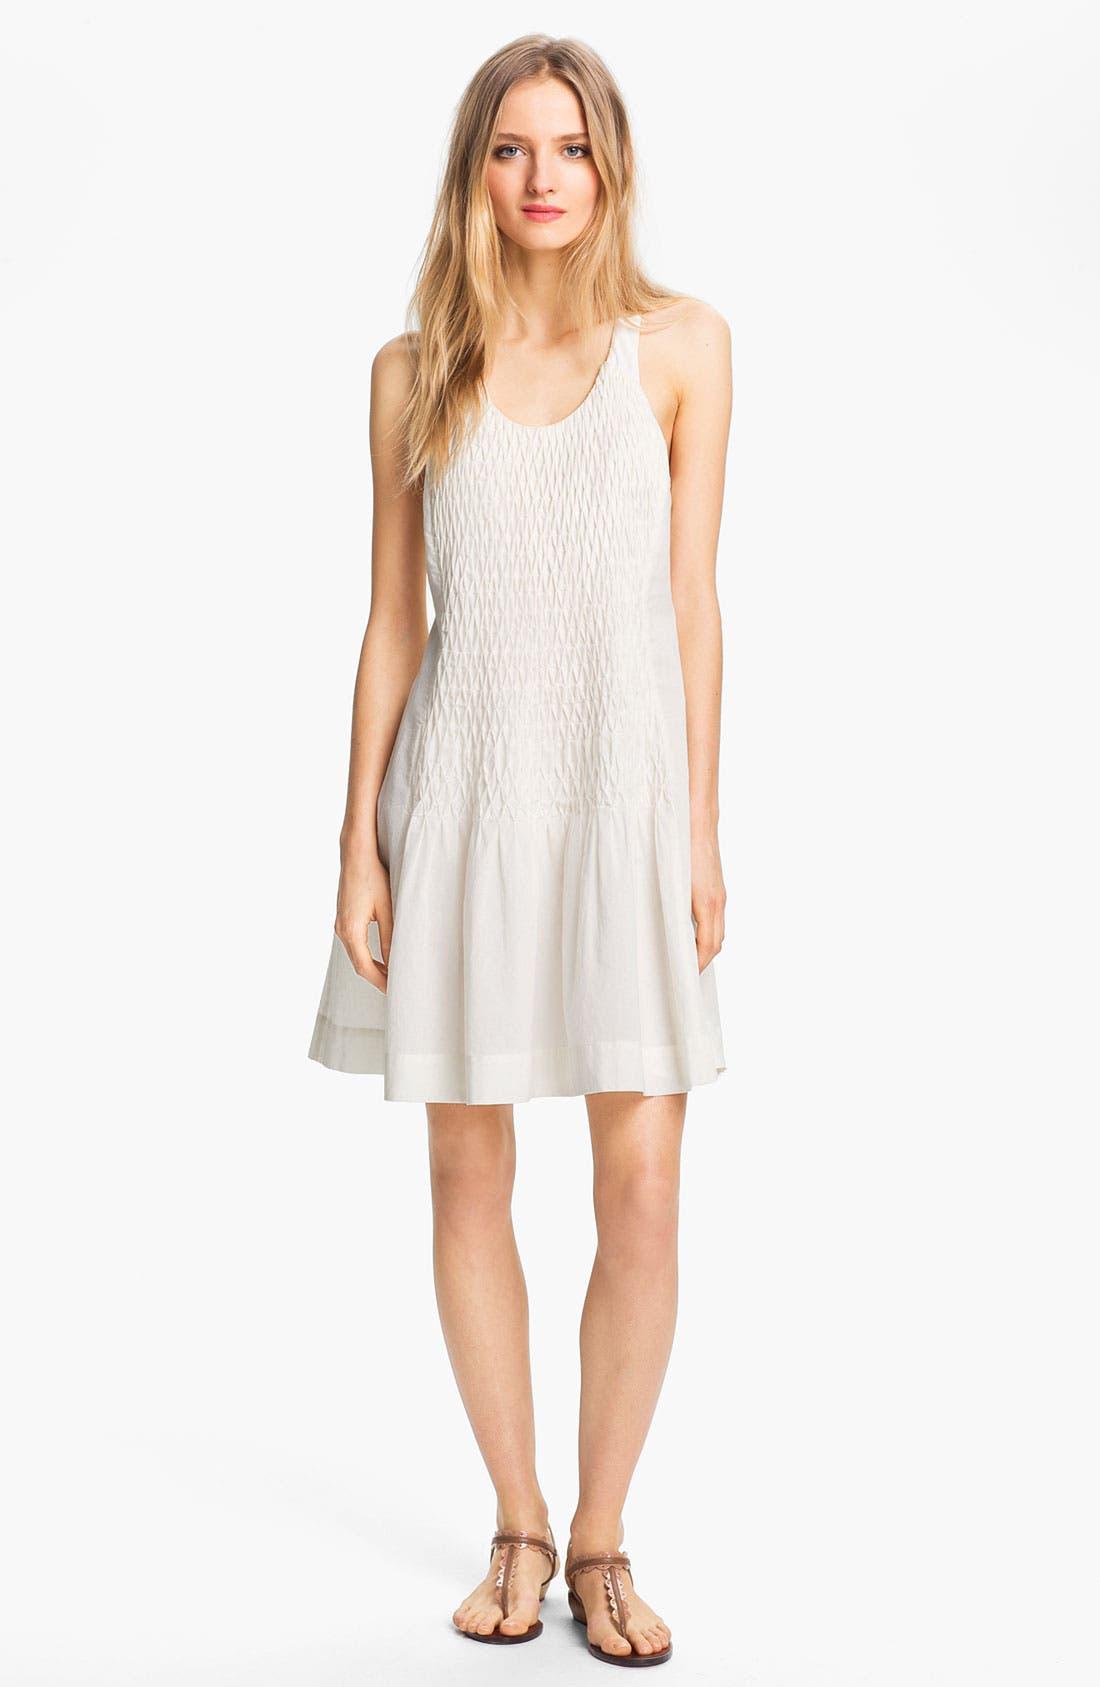 Main Image - rag & bone 'Ivette' Racerback Dress